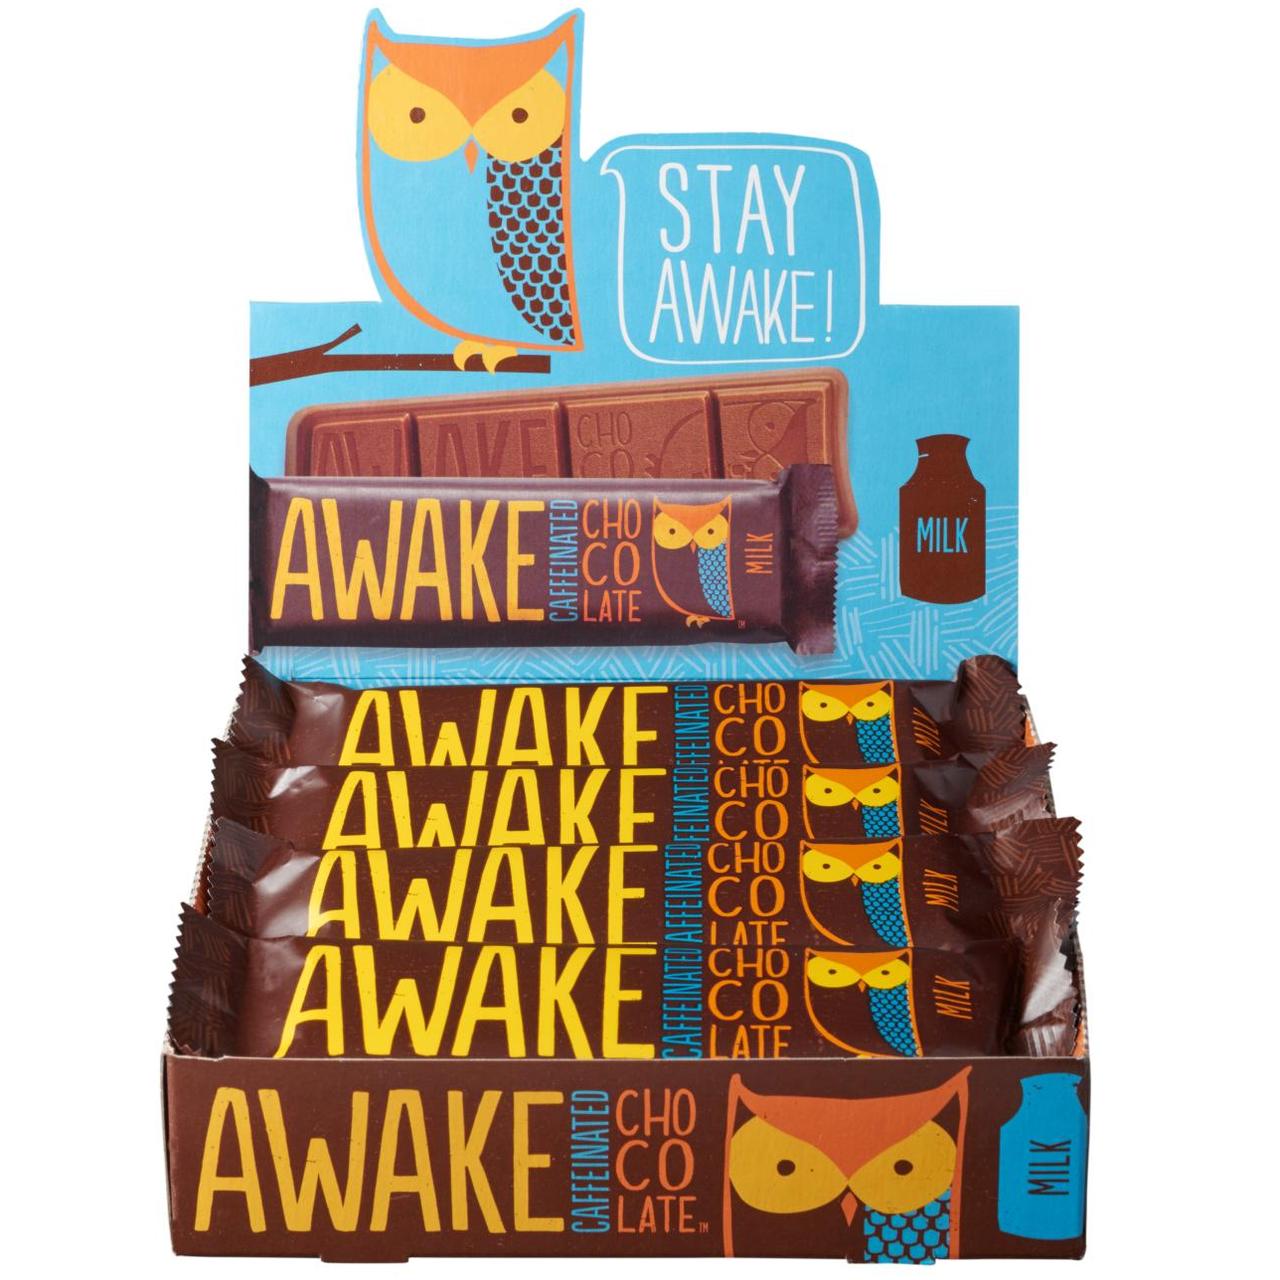 Awake Chocolate, Caffinated Chocolate Bar Milk Chocolate, 1.55 oz. Bar (12 Count) - RocketDSD